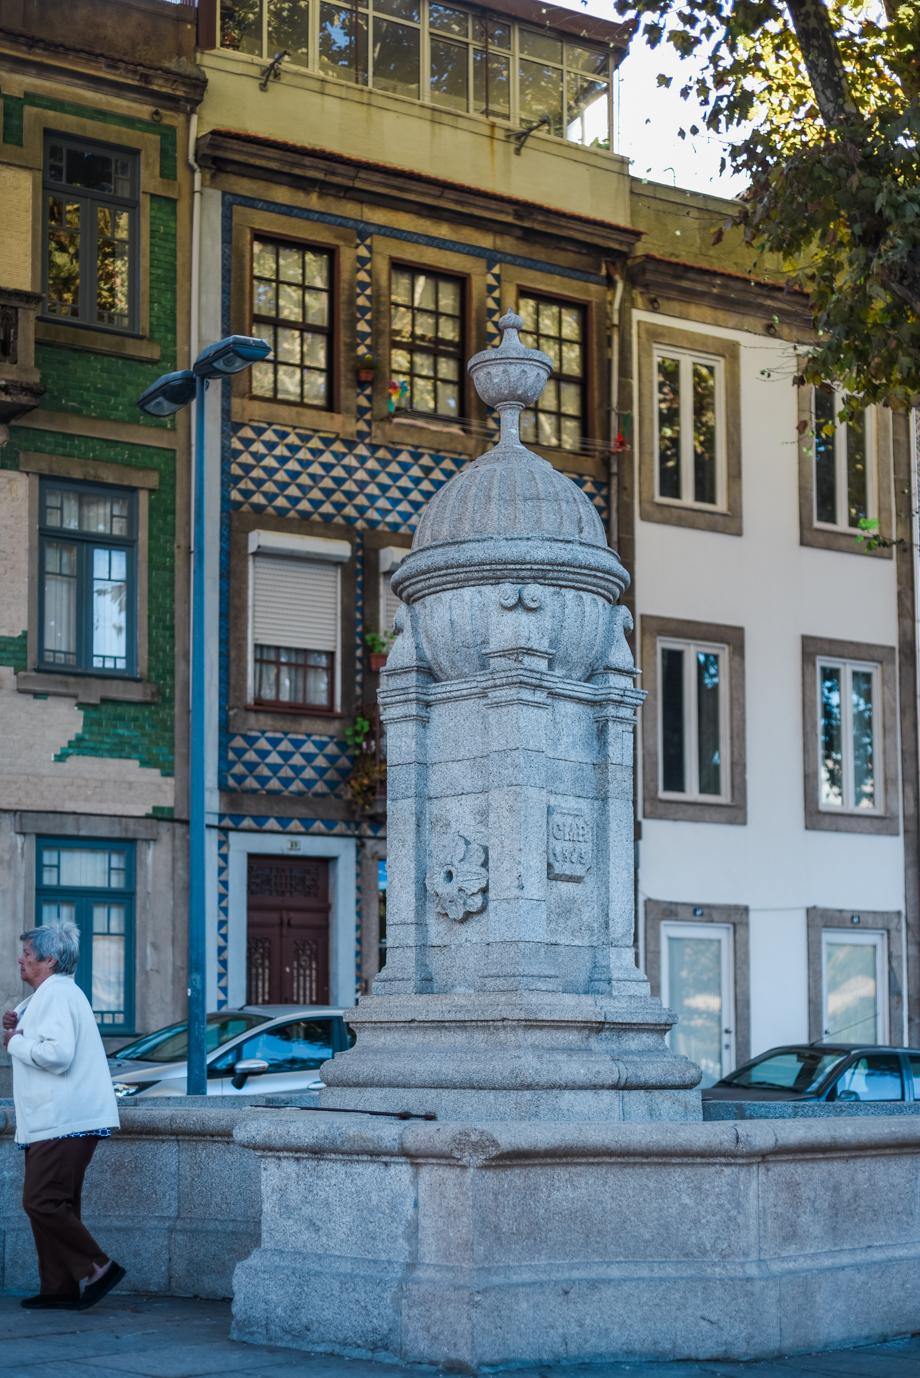 WebQuality-Porto-10yearsVentigrate-AnaisStoelenPhotography-92.jpg